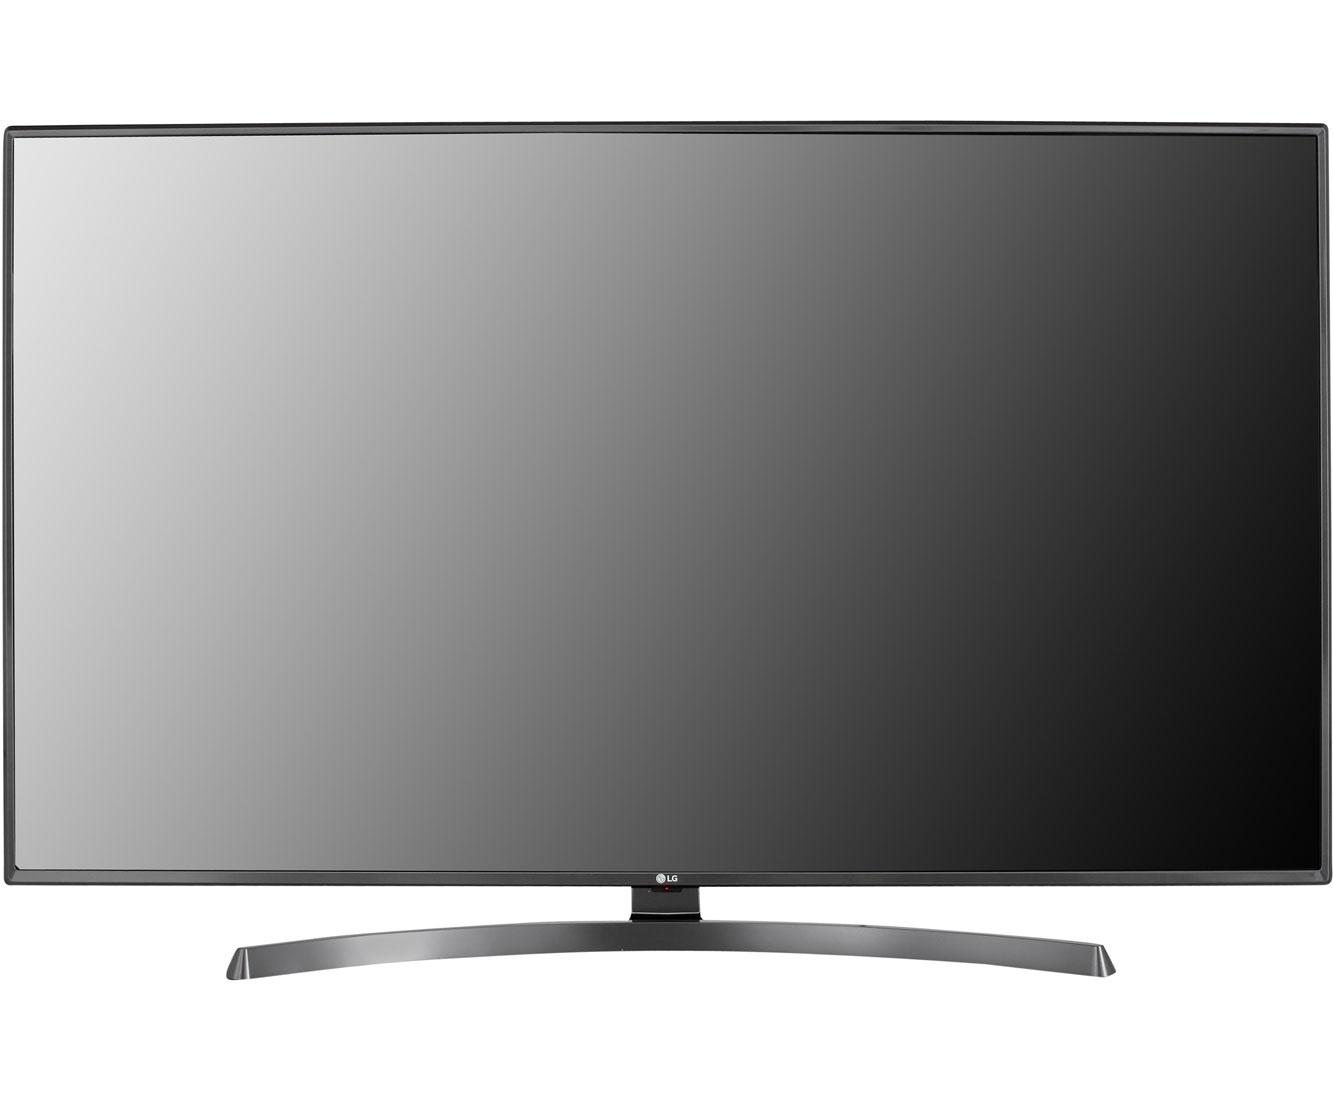 lg 65uk6750pld 4k uhd led fernseher 164 cm 65 zoll schwarz ebay. Black Bedroom Furniture Sets. Home Design Ideas